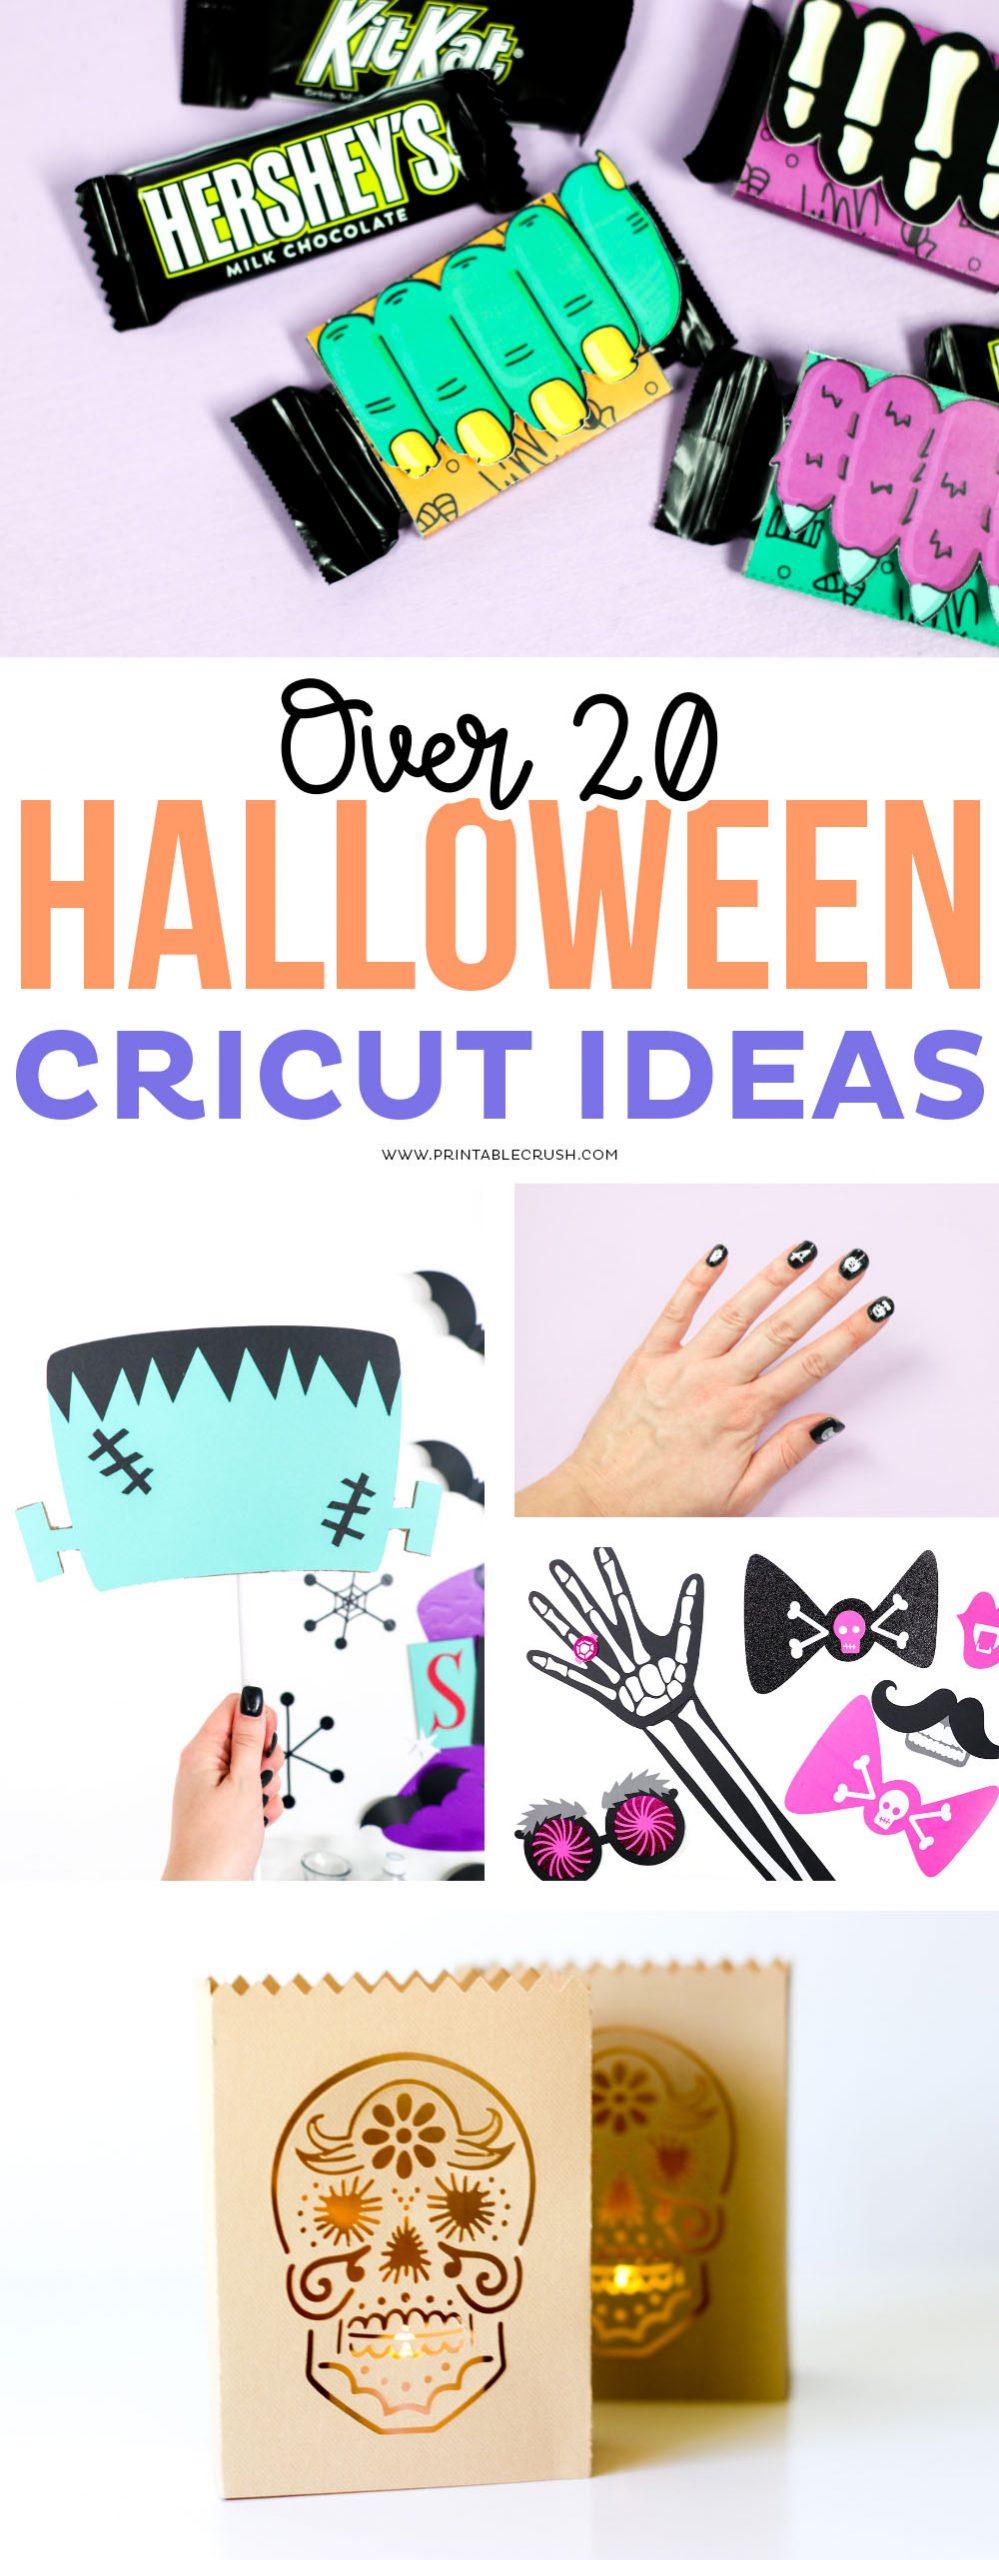 Cricut Ideas for Halloween via @printablecrush